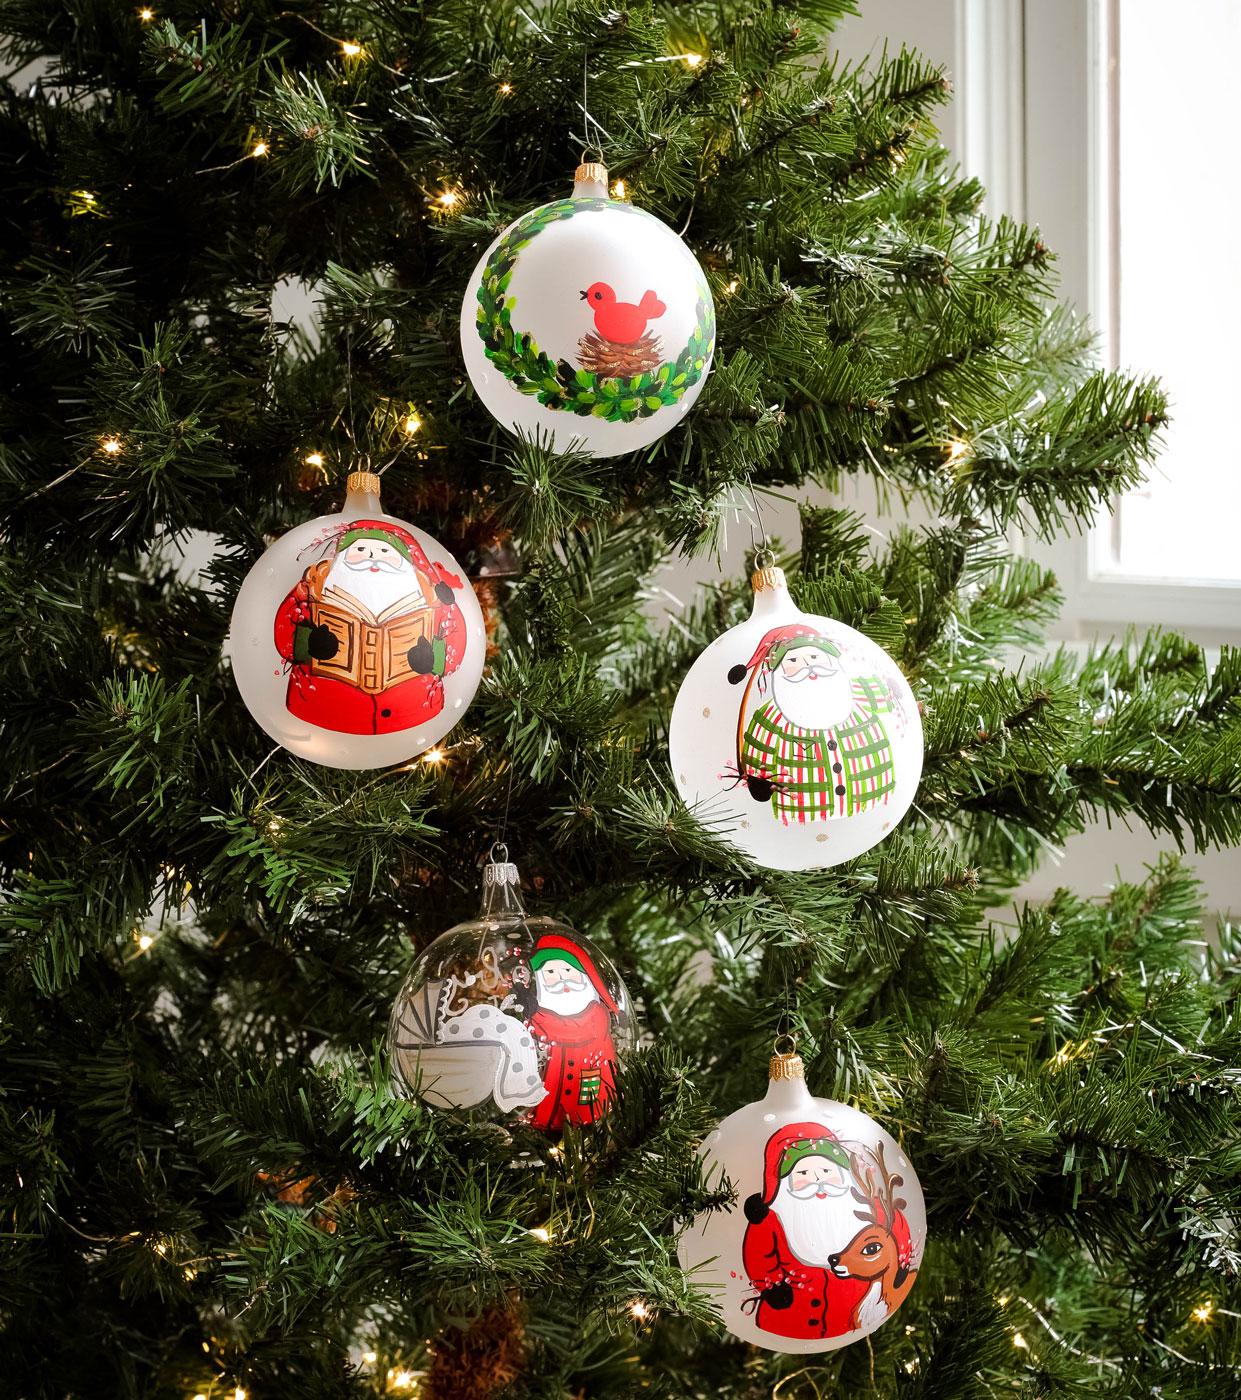 vietri-ornaments-3.jpg